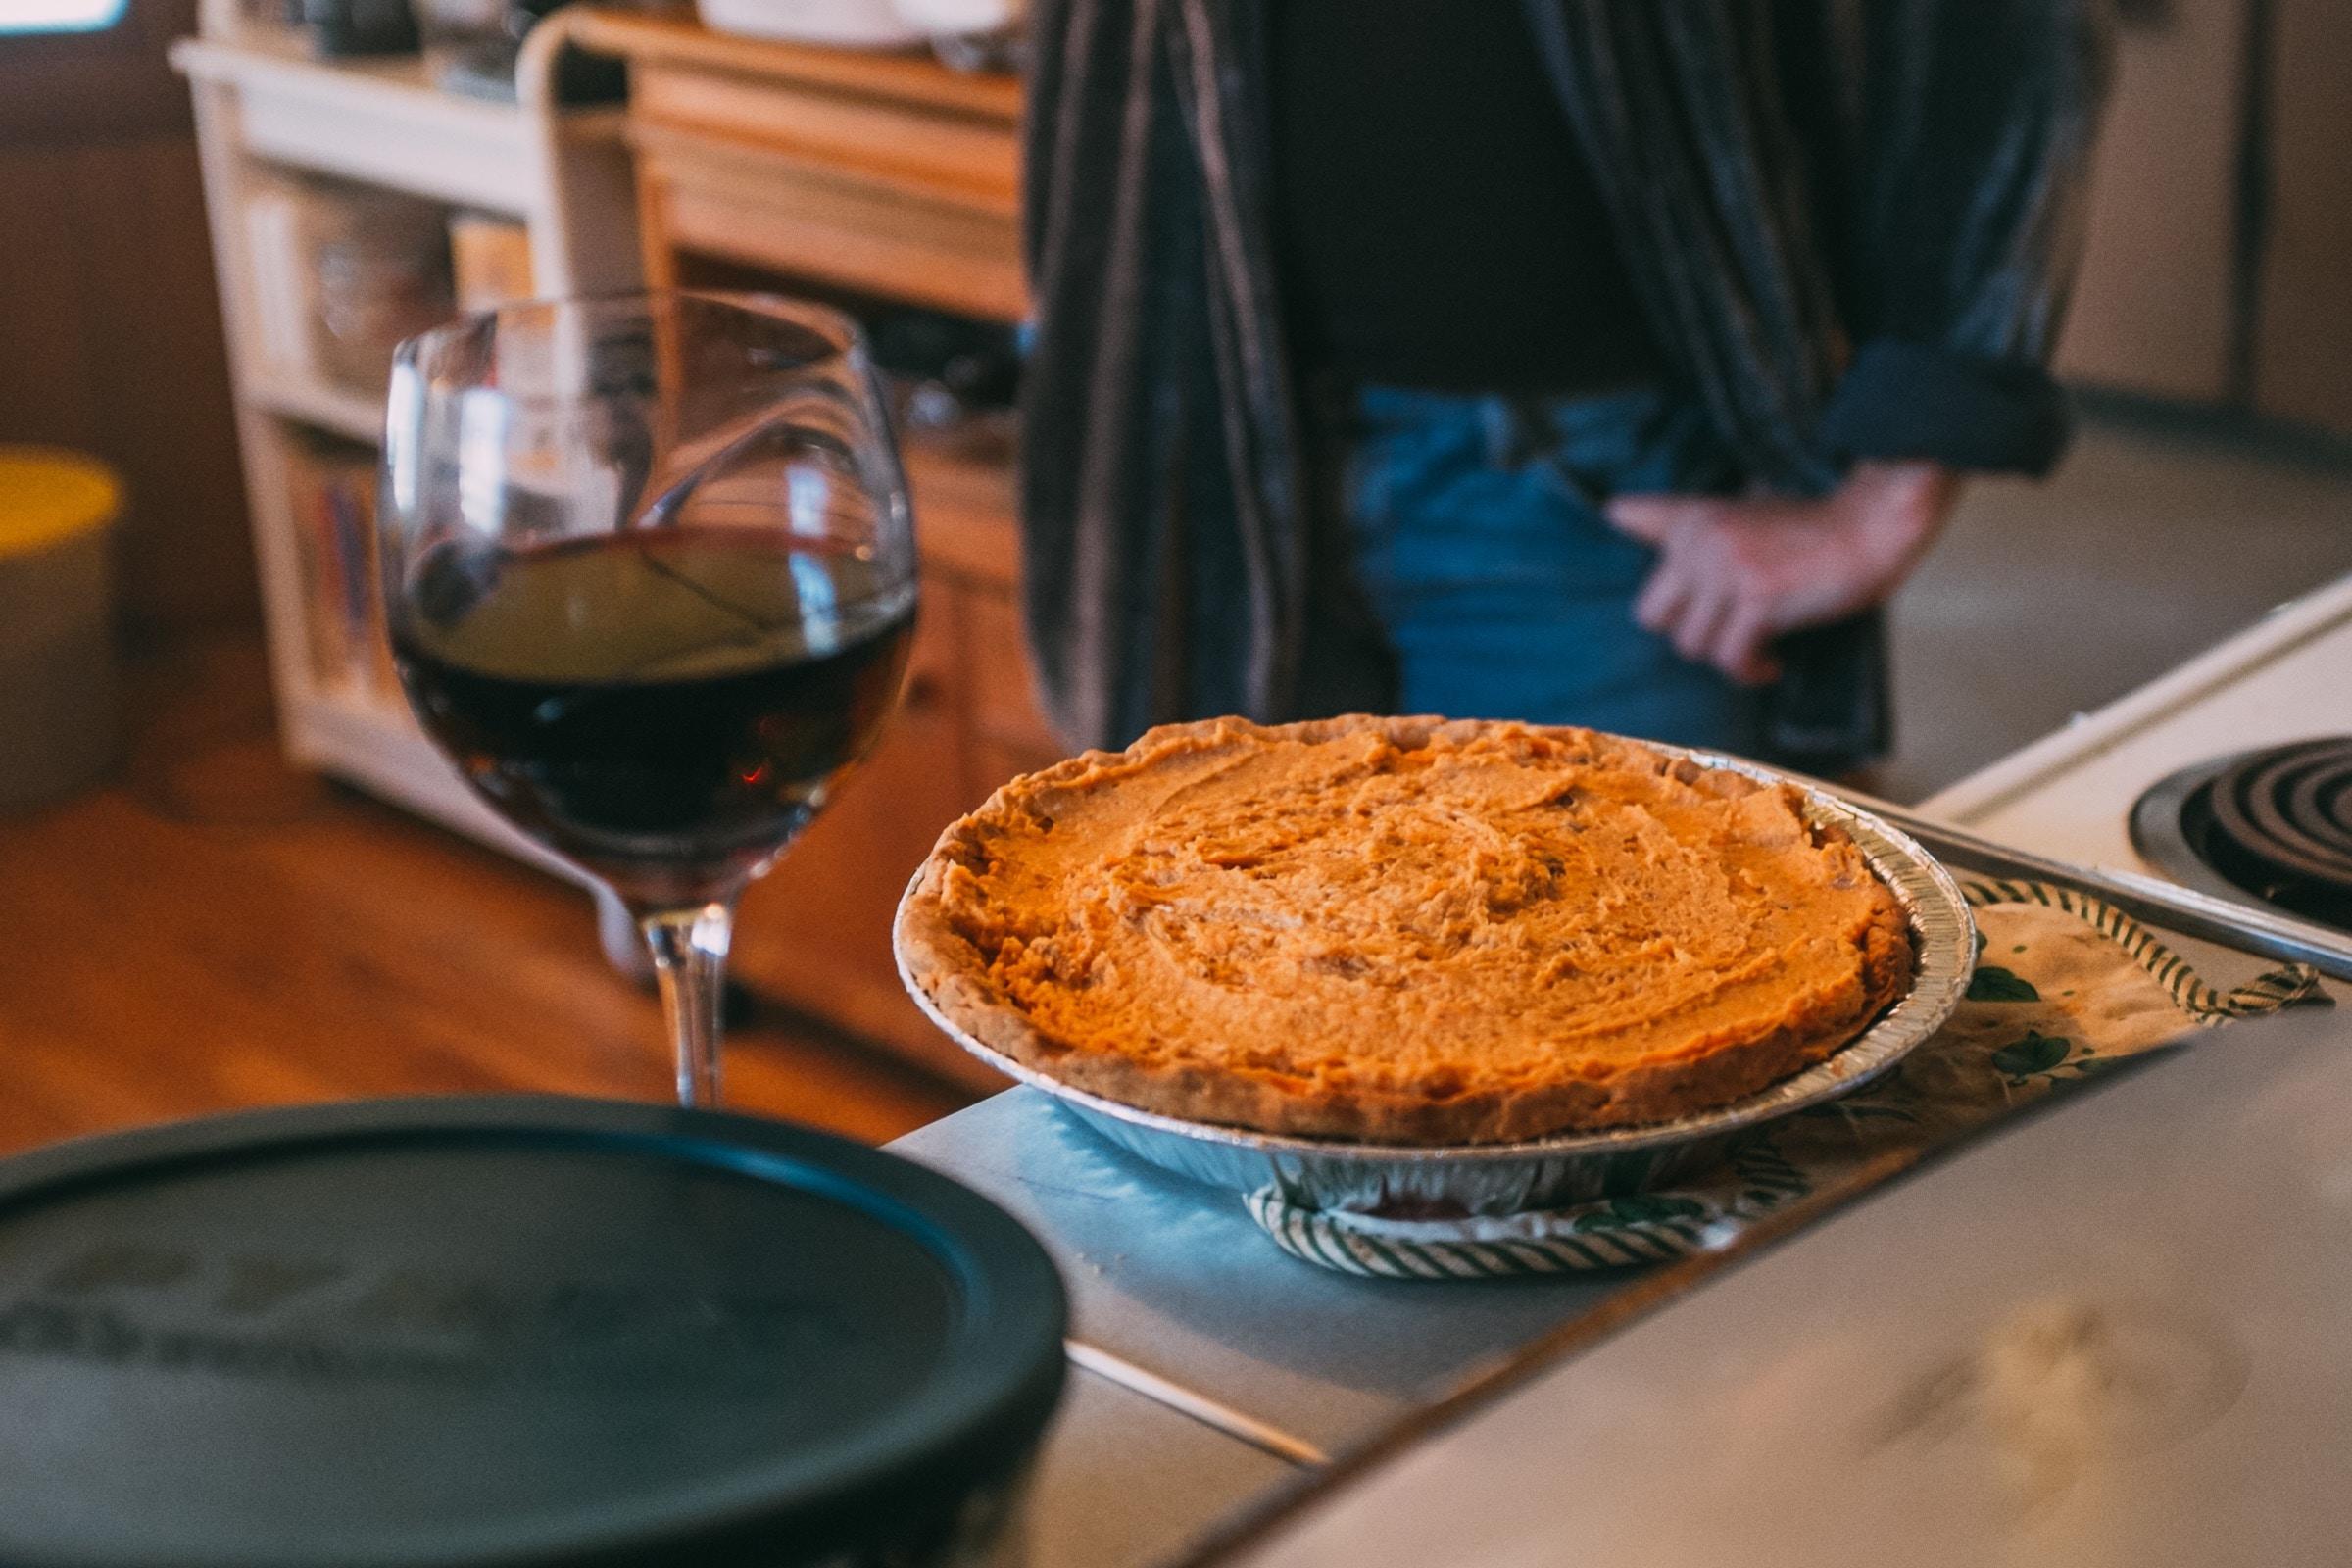 A pie next to a glass of wine.